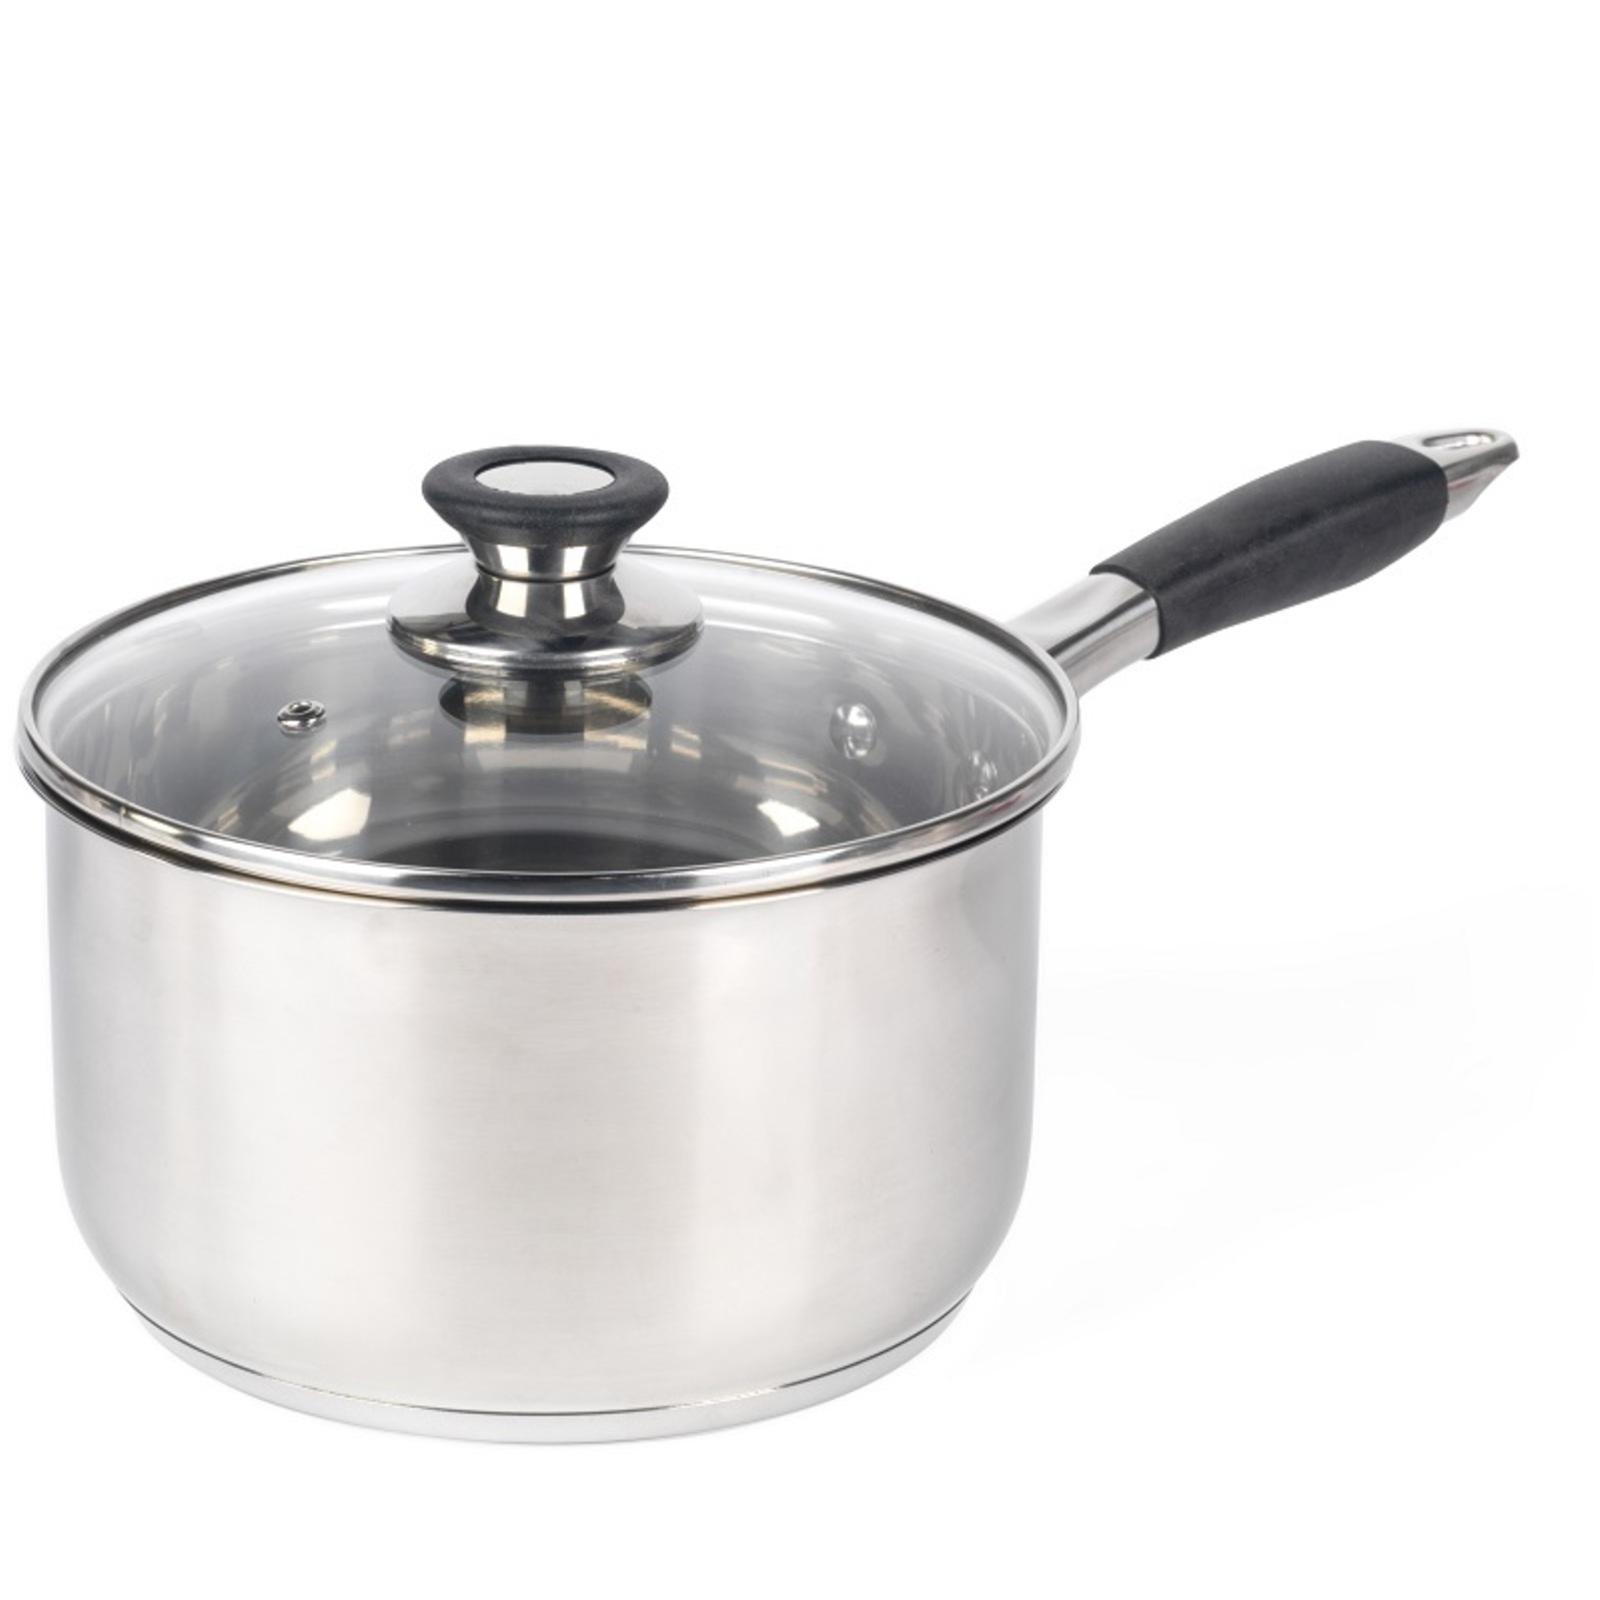 Salter 20cm Stainless Steel Non Stick Saucepan Black Handle Dishwasher Safe